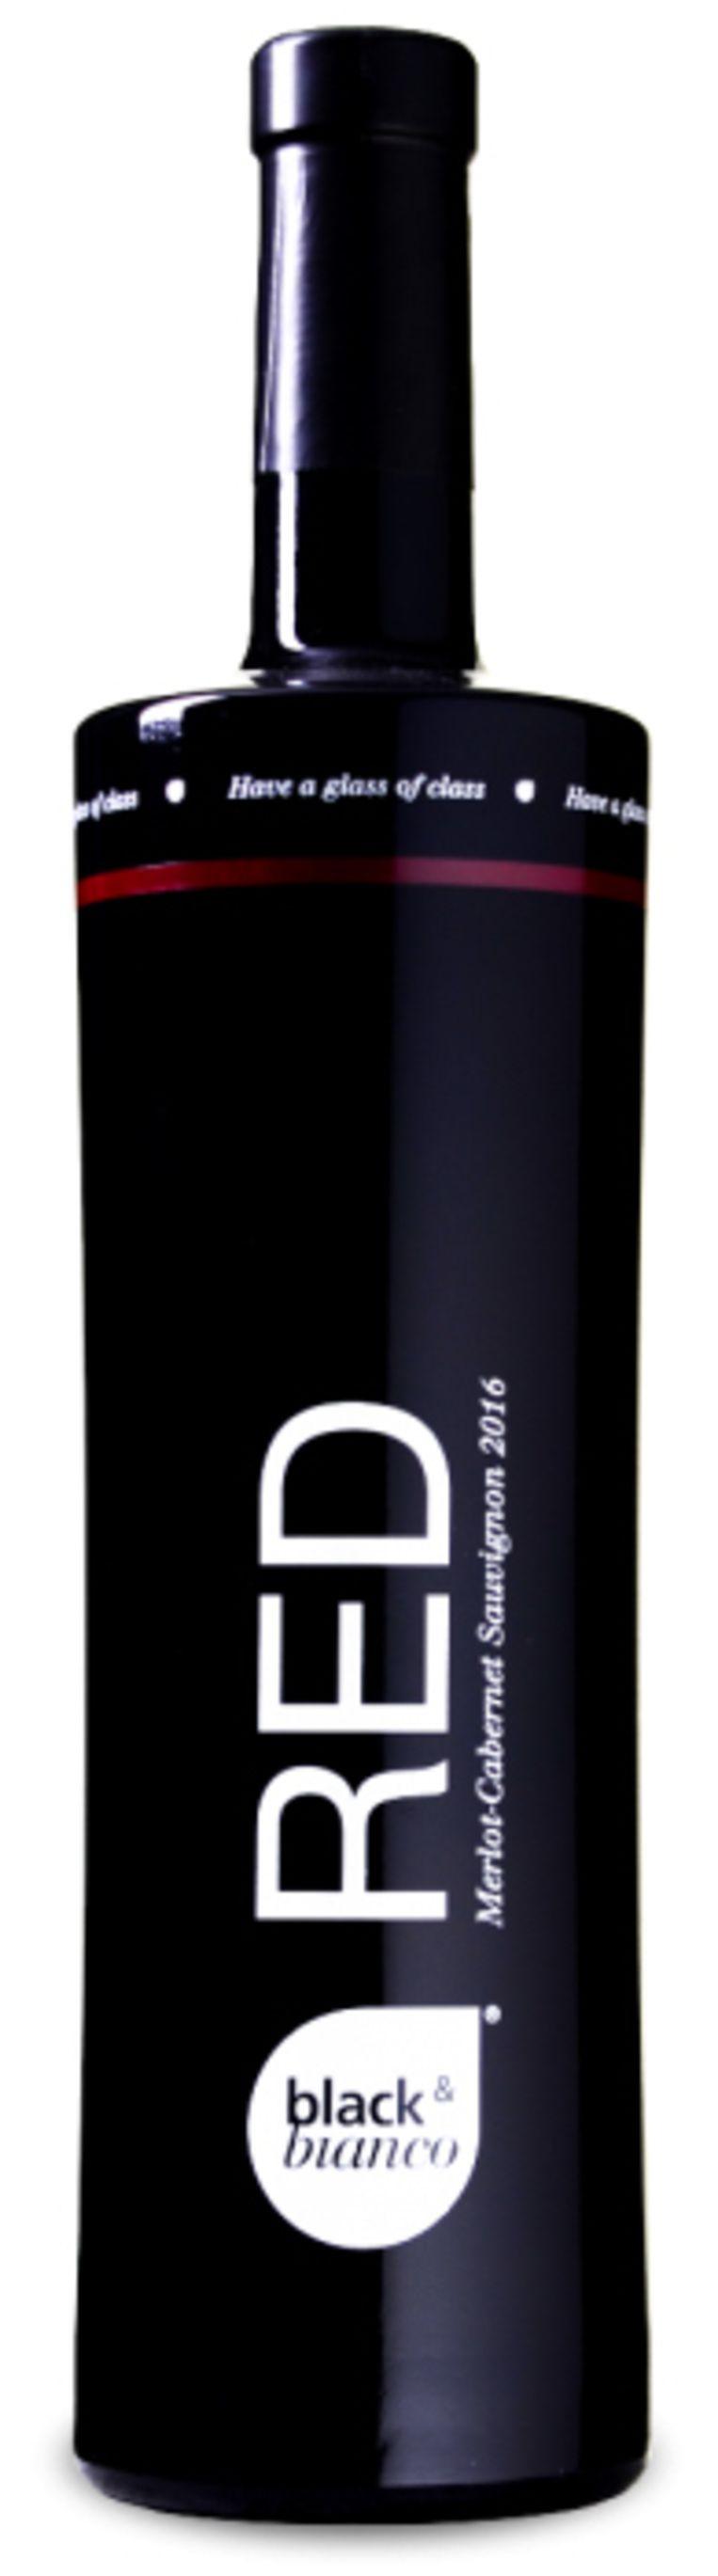 Black & Bianco Merlot Cabernet Sauvignon Beeld RV